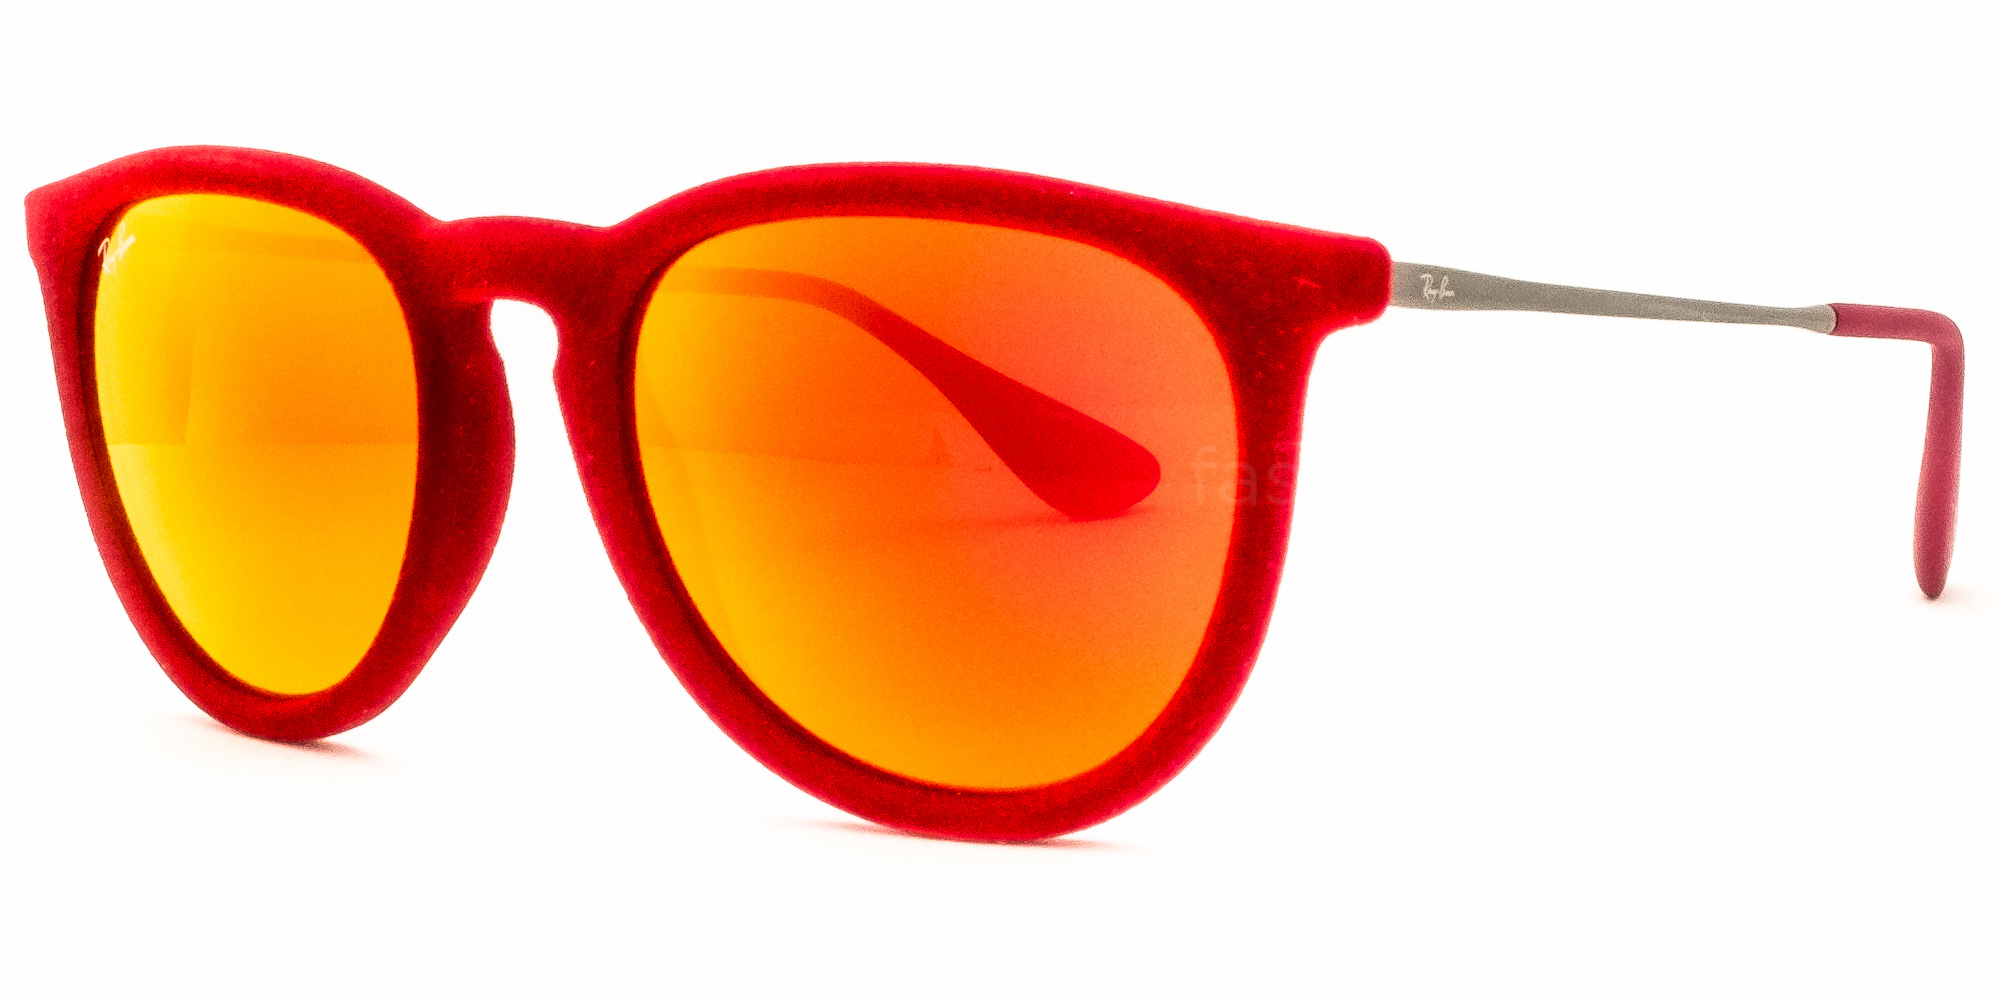 Ray ban 4171 sunglasses for Decor my eyes